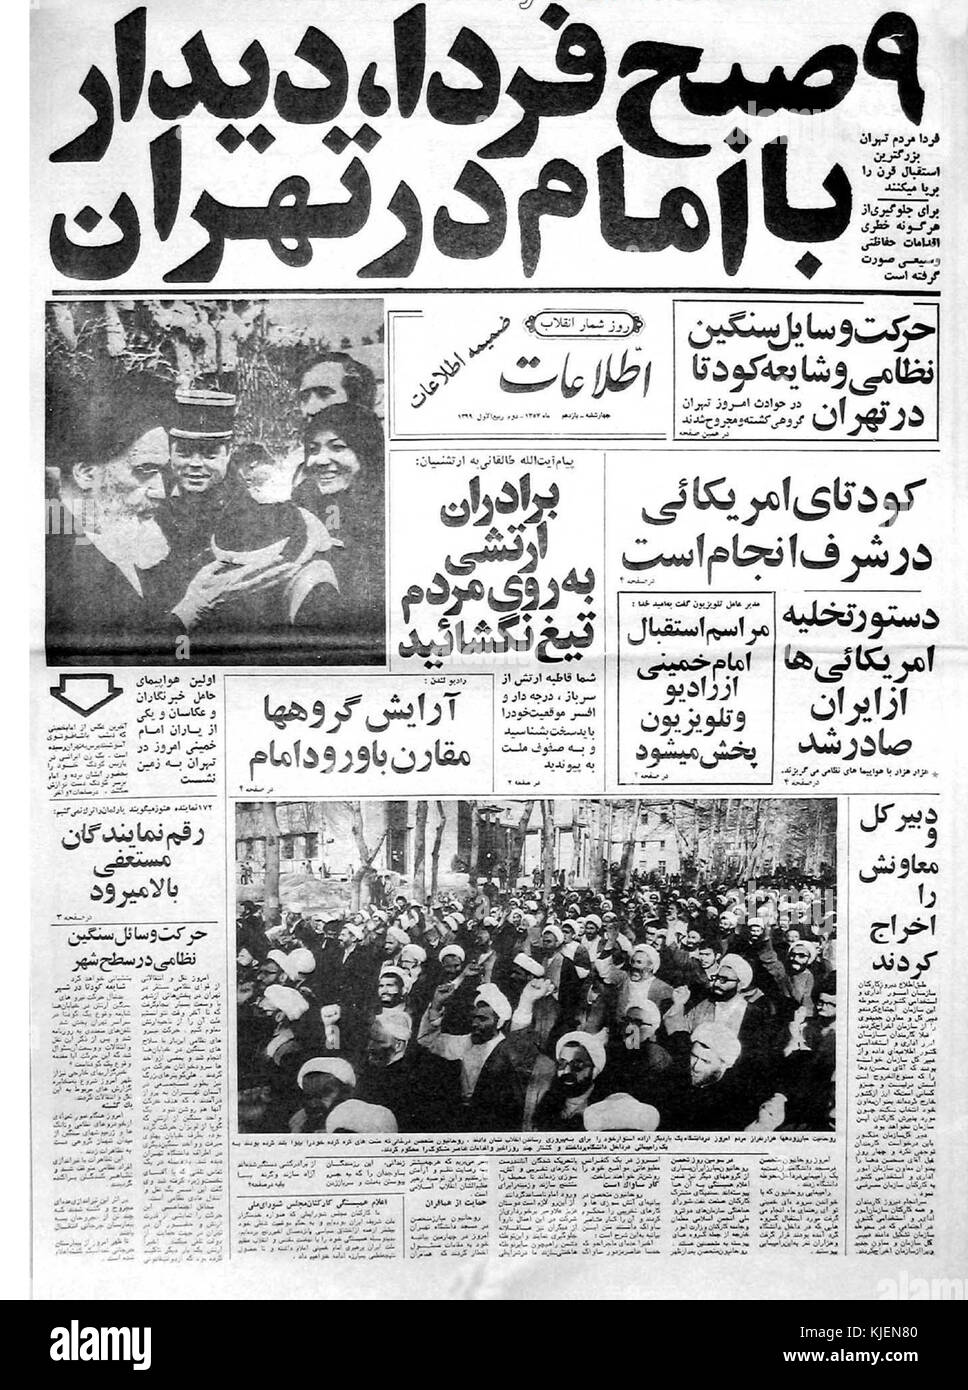 Newspaper title Iranian revolution - Stock Image